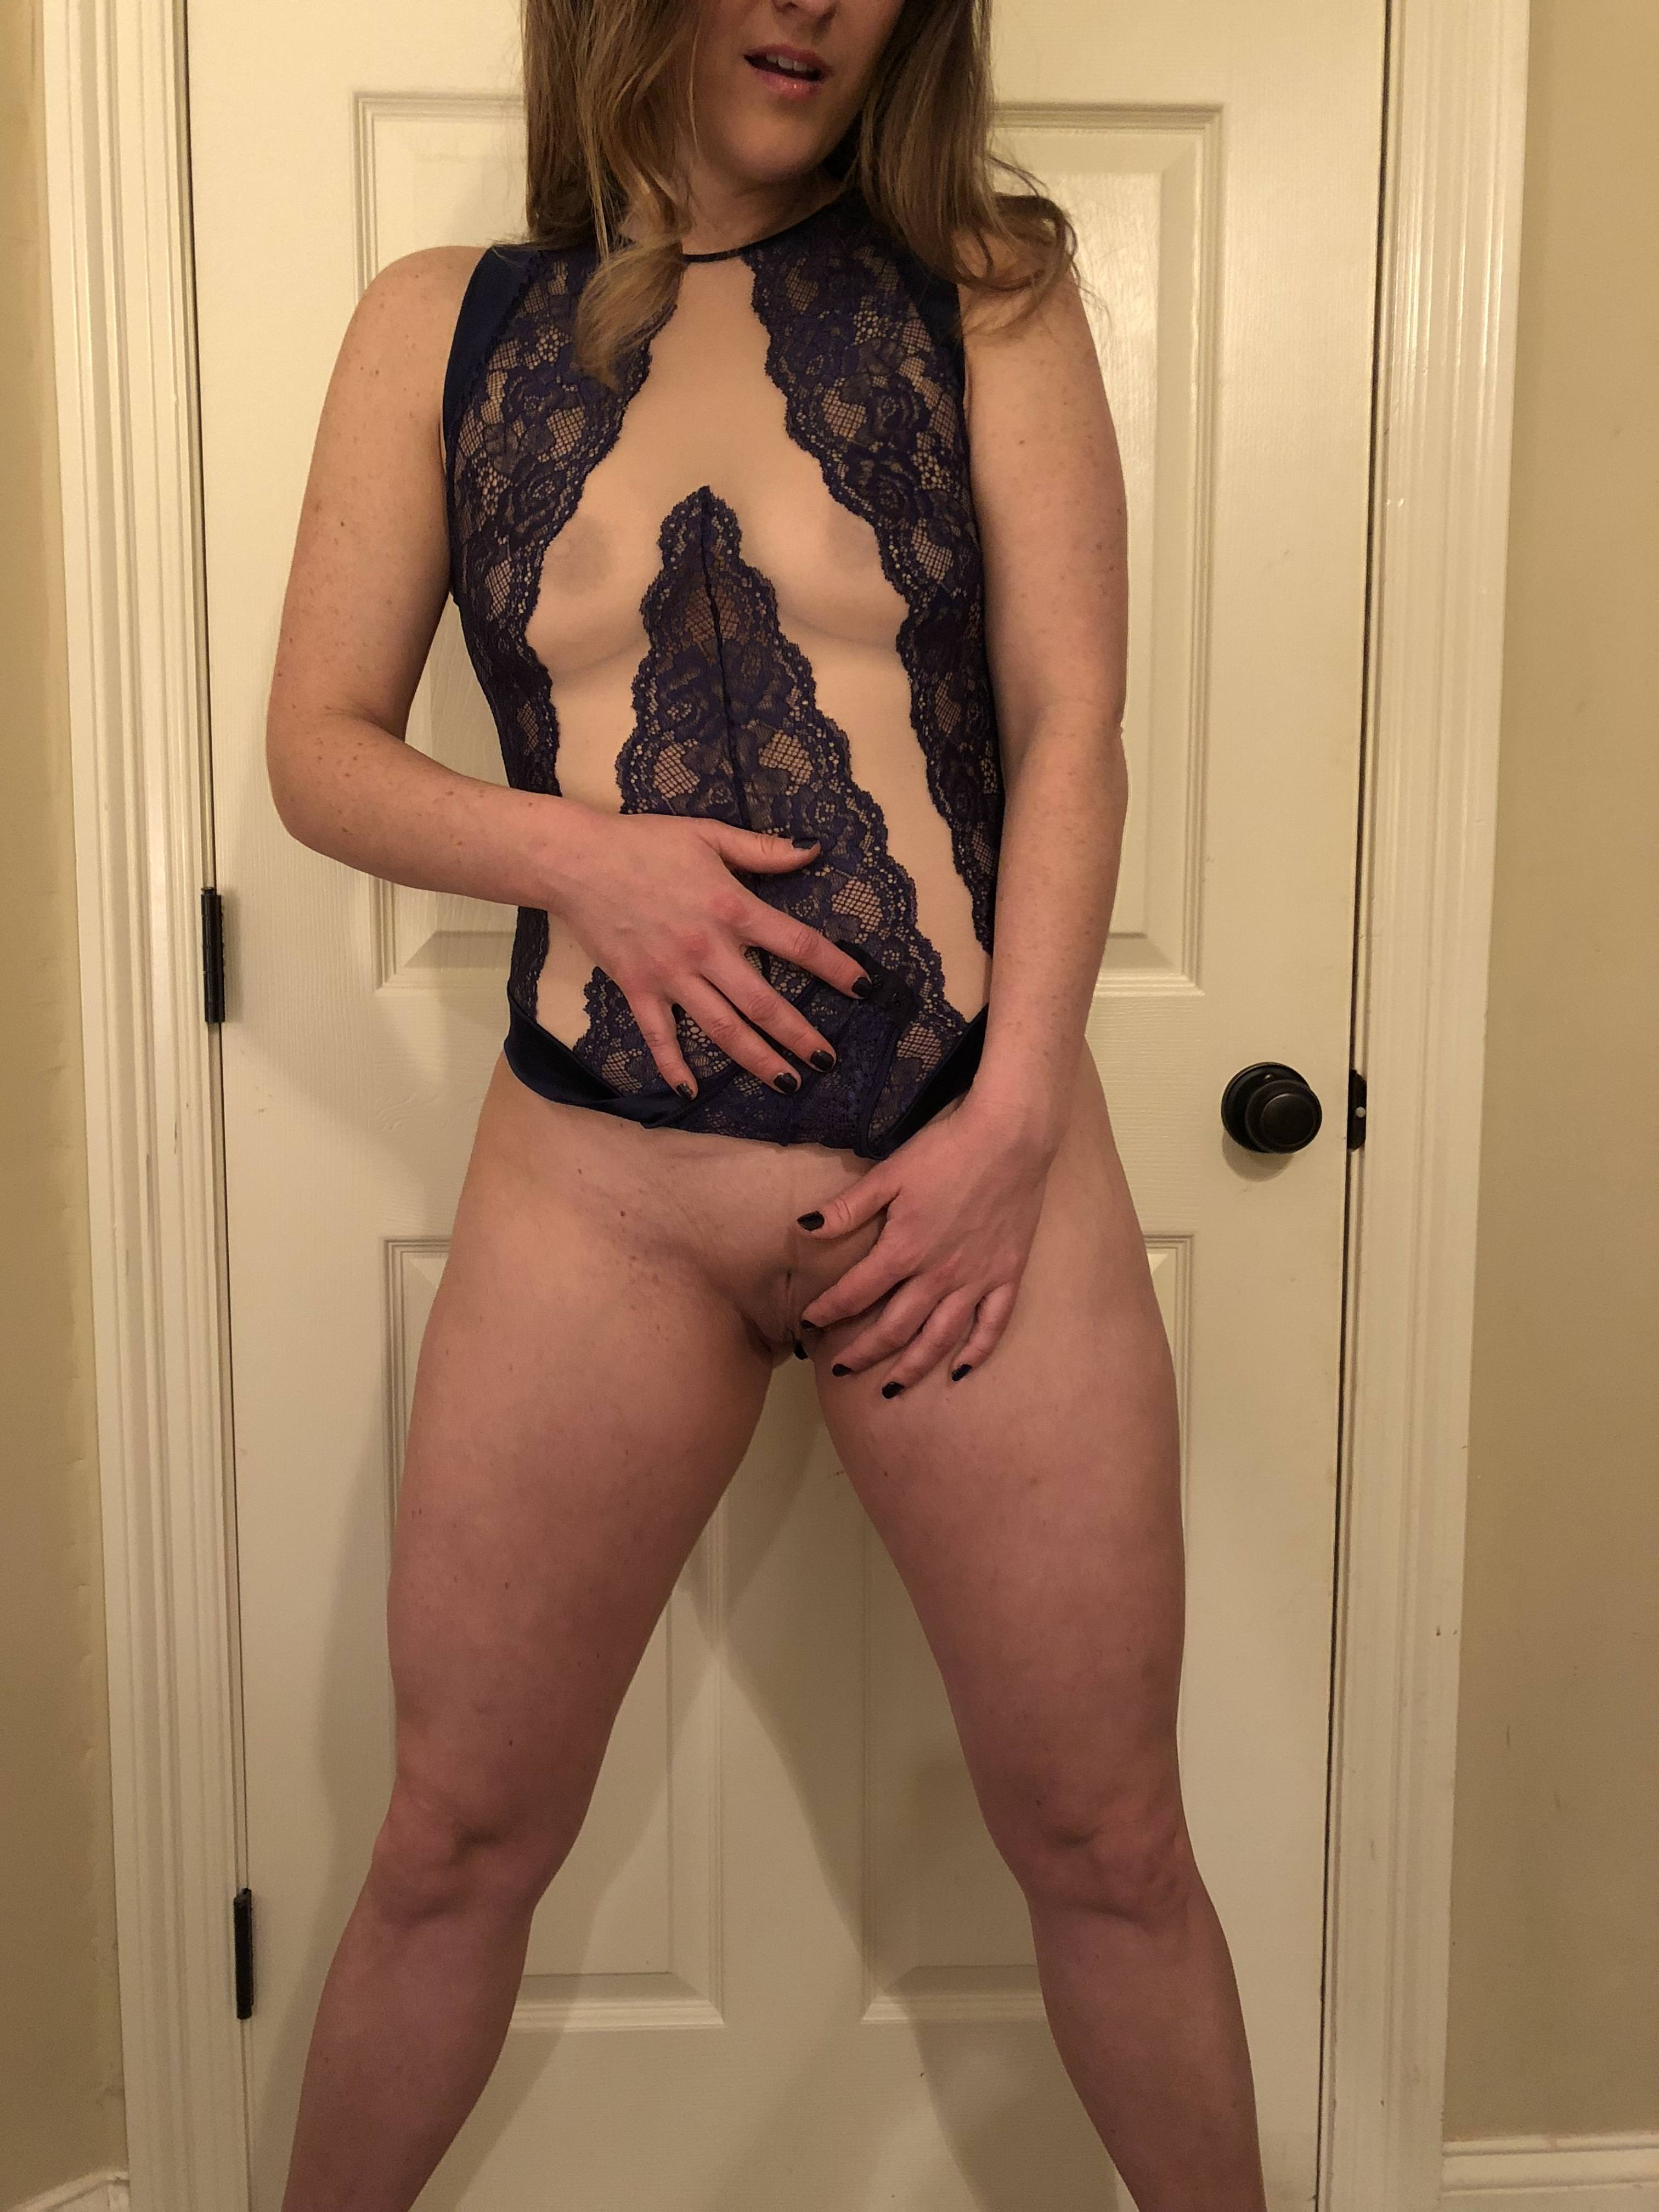 Amateur Pussy Lingerie Porn my new lingerie has a snap-open crotch! 32[f] porn pic - eporner